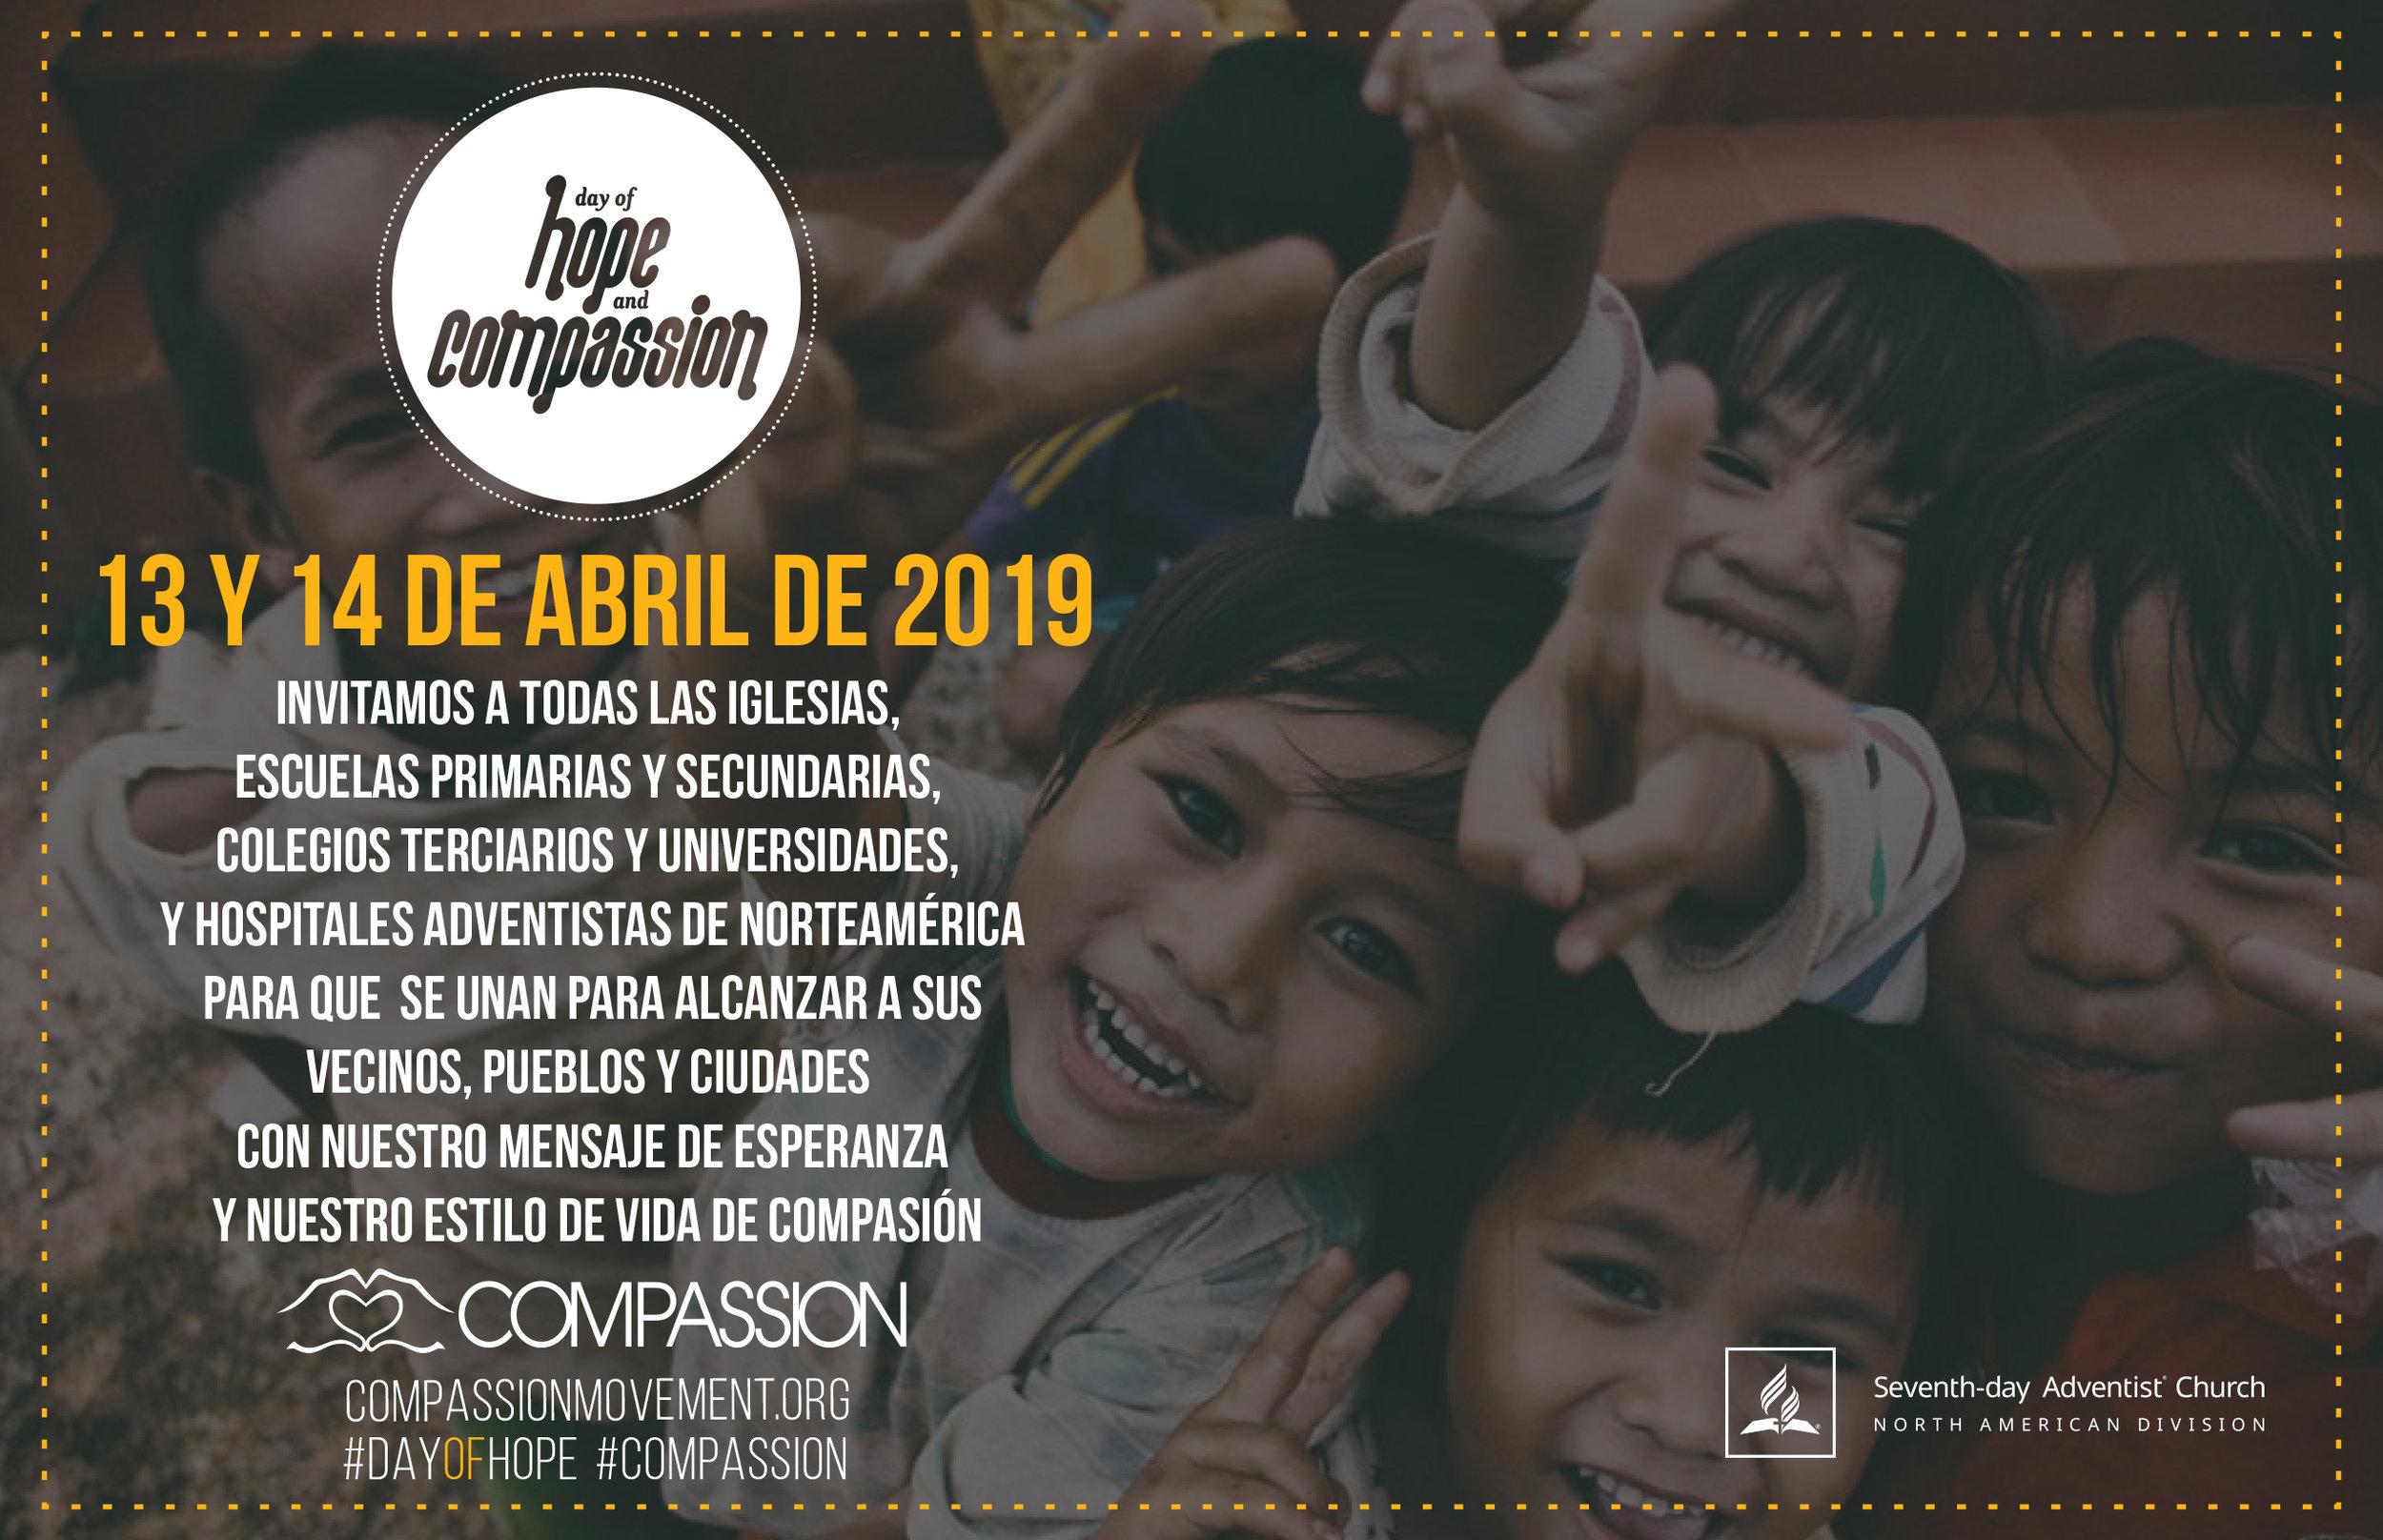 Tarjetas de Compassion-2.jpg